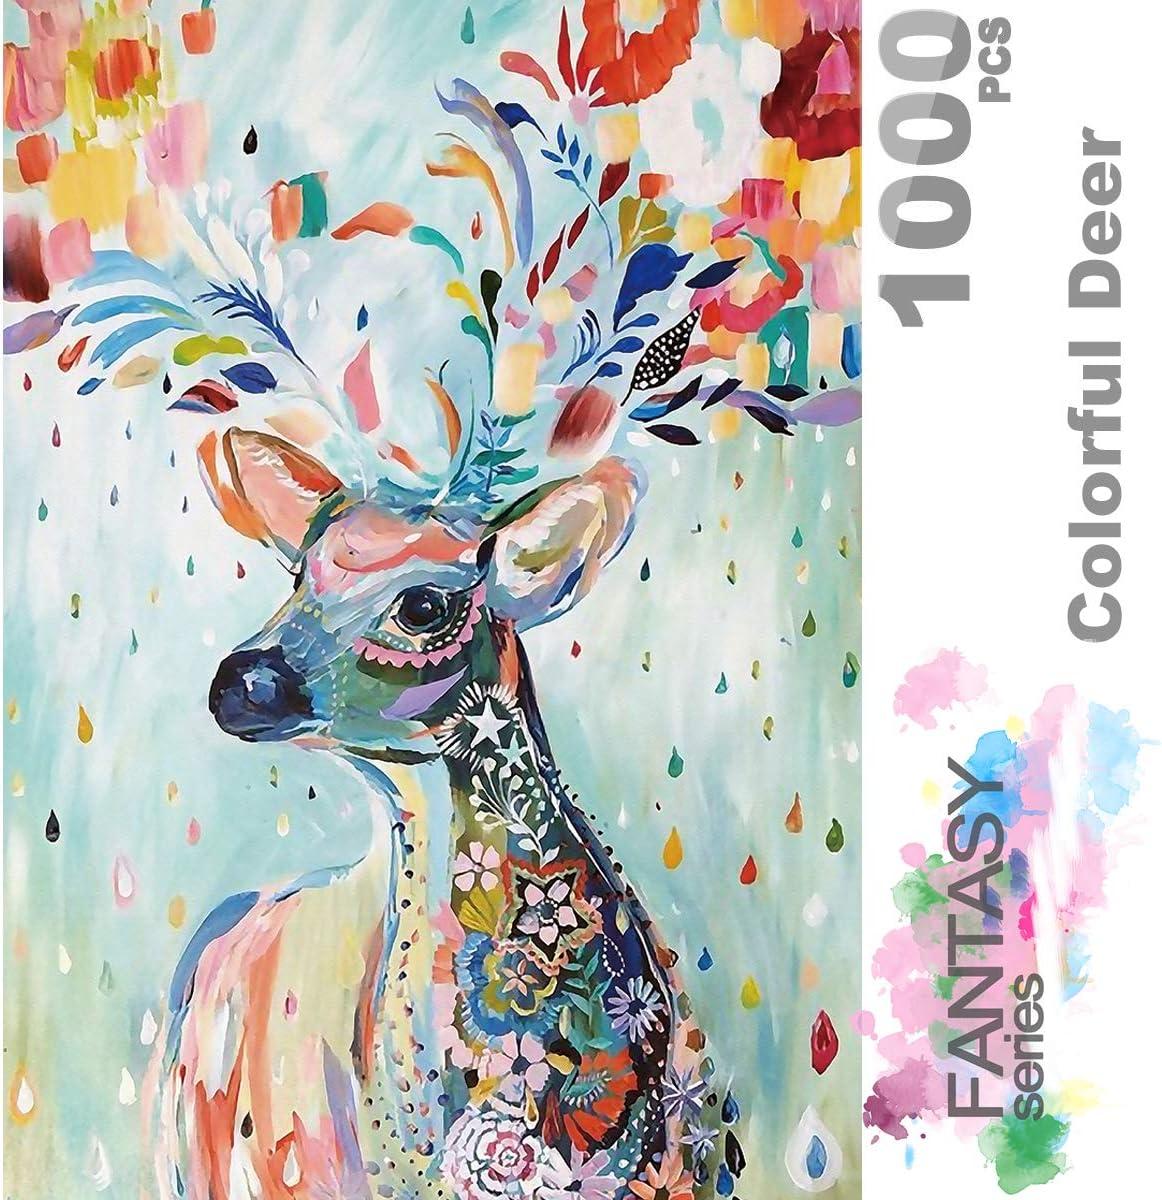 Ingooood- Jigsaw Puzzle- Fantasy Series- Flower Raindrop Colorful Deer - 1000 Piezas para Adultos